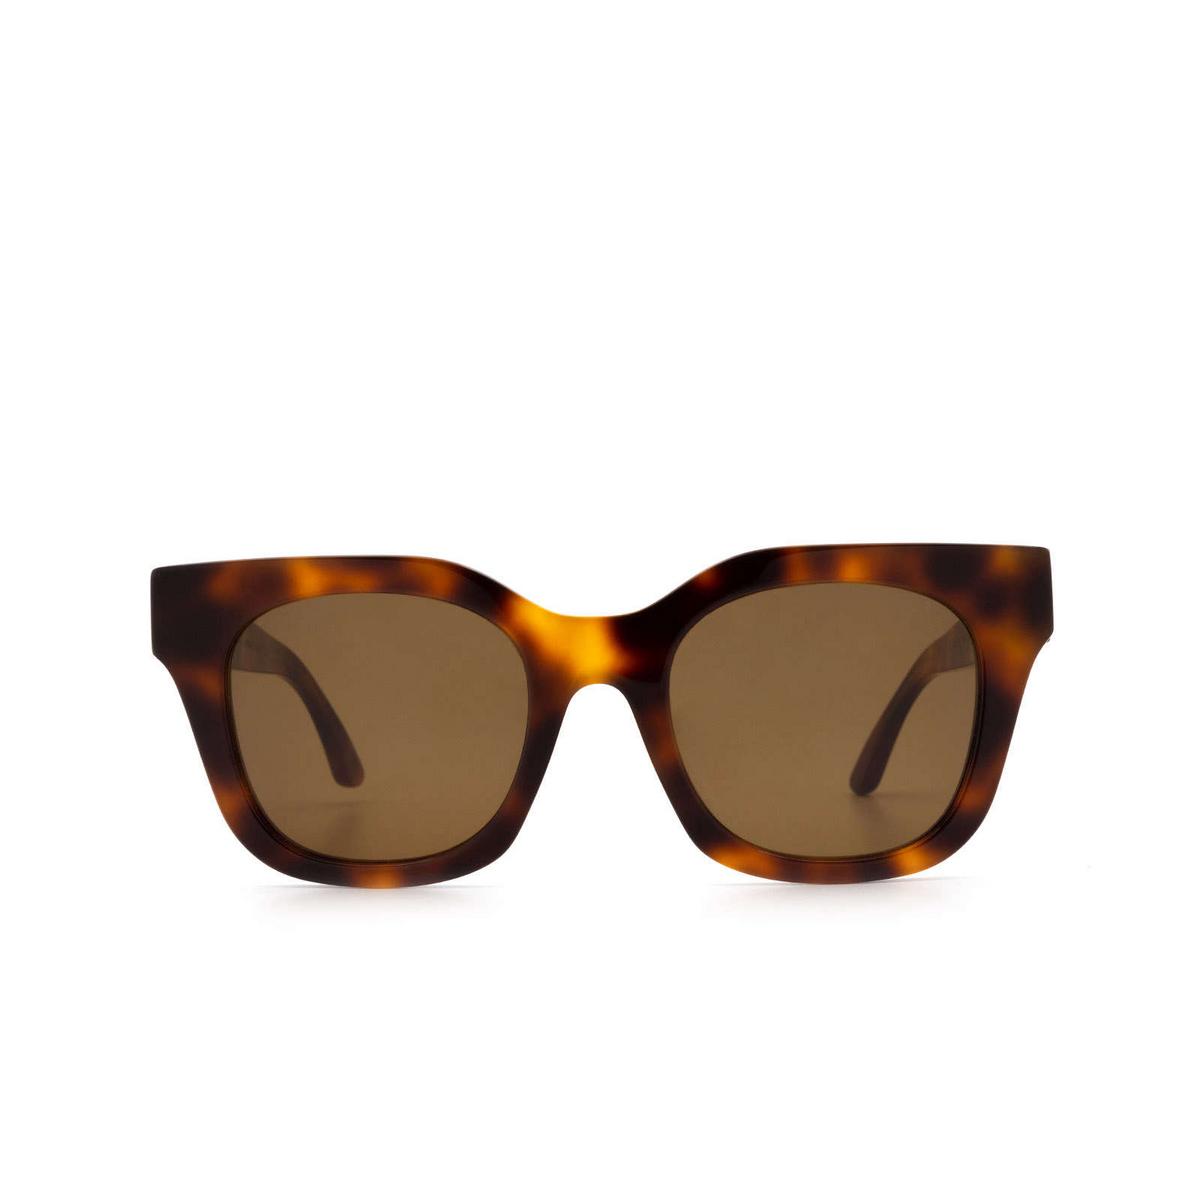 Huma® Square Sunglasses: Blue color Havana 00 - front view.